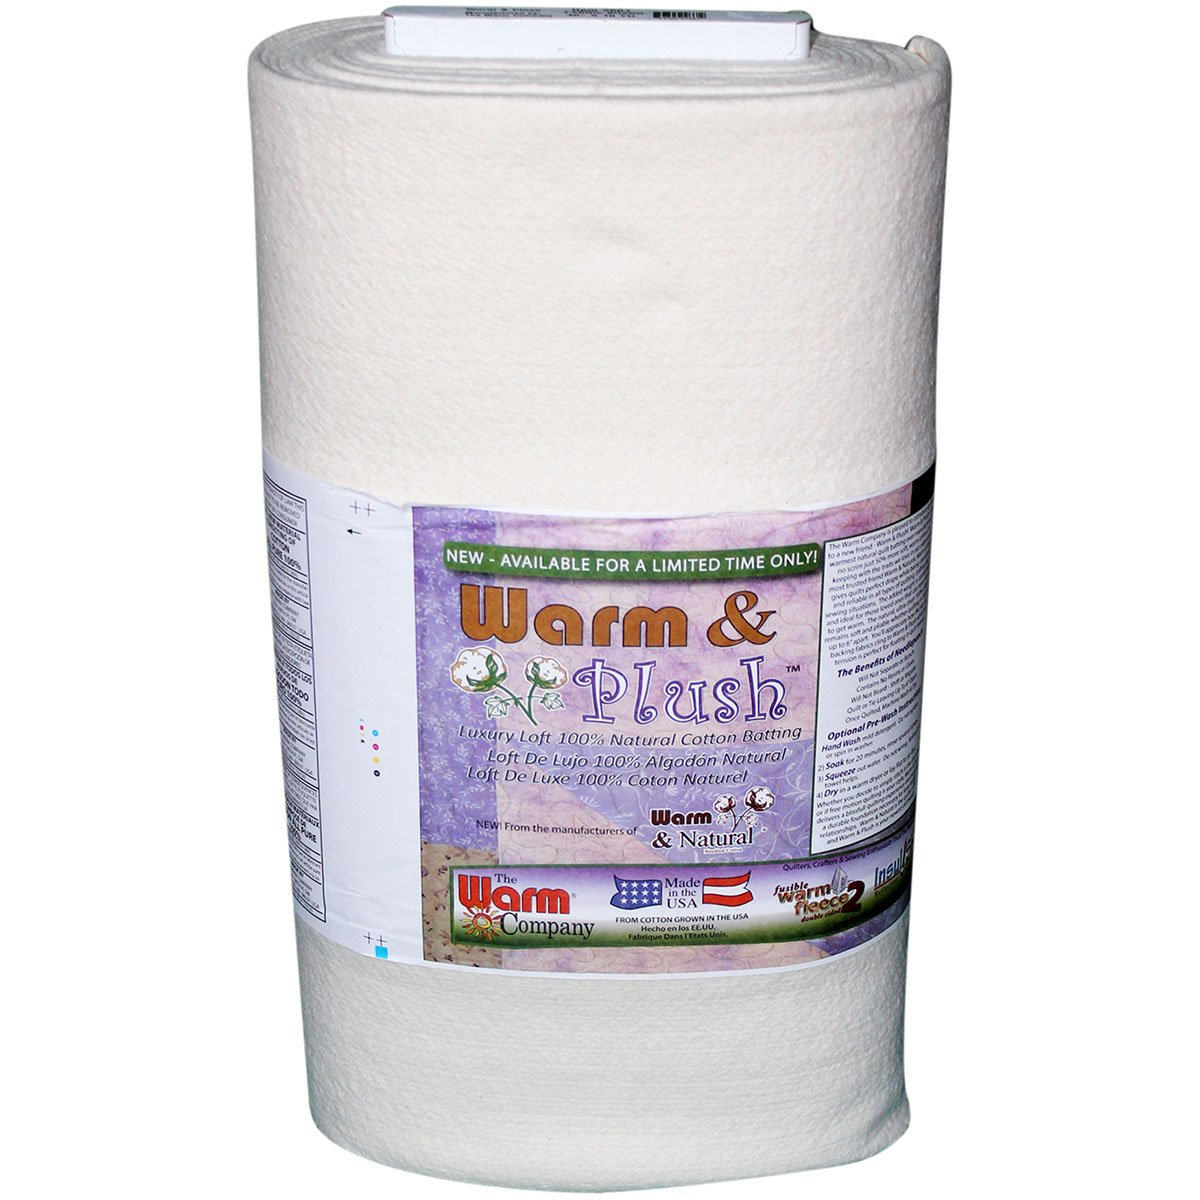 WARM COMPANY 2661 Warm and Plush Cotton Batting by The Yard, 45 by 10-Yard, Crib 45 by 10-Yard Notions